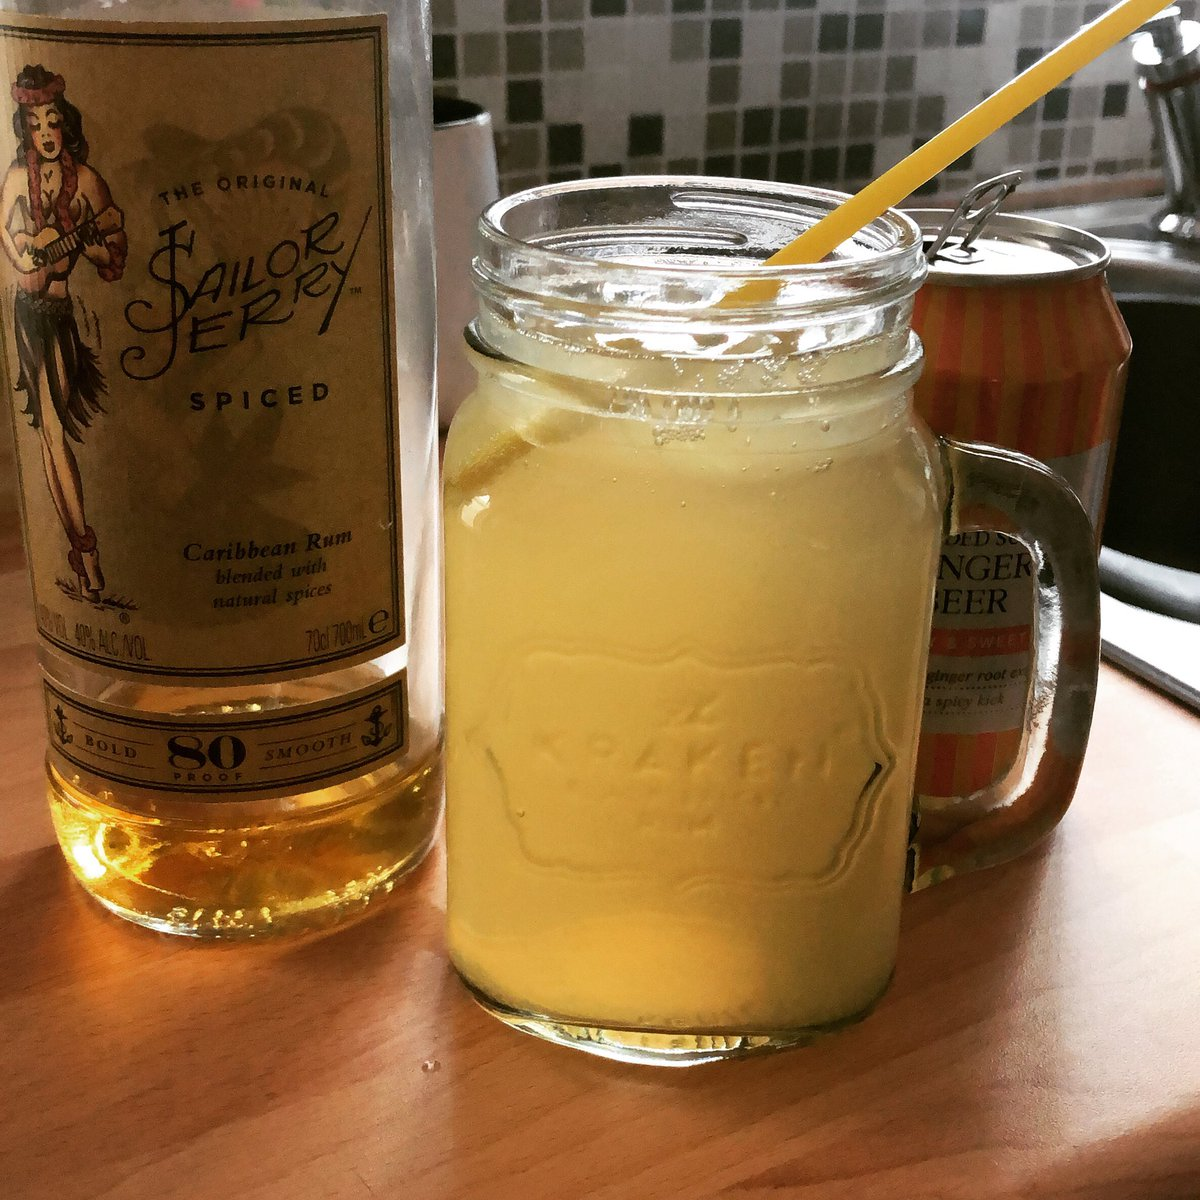 Ninety hundredth and eleventy night in with the girls! #lockdown #rum #gingerbeer #wellmeetagainpic.twitter.com/K0GxjXTpkk